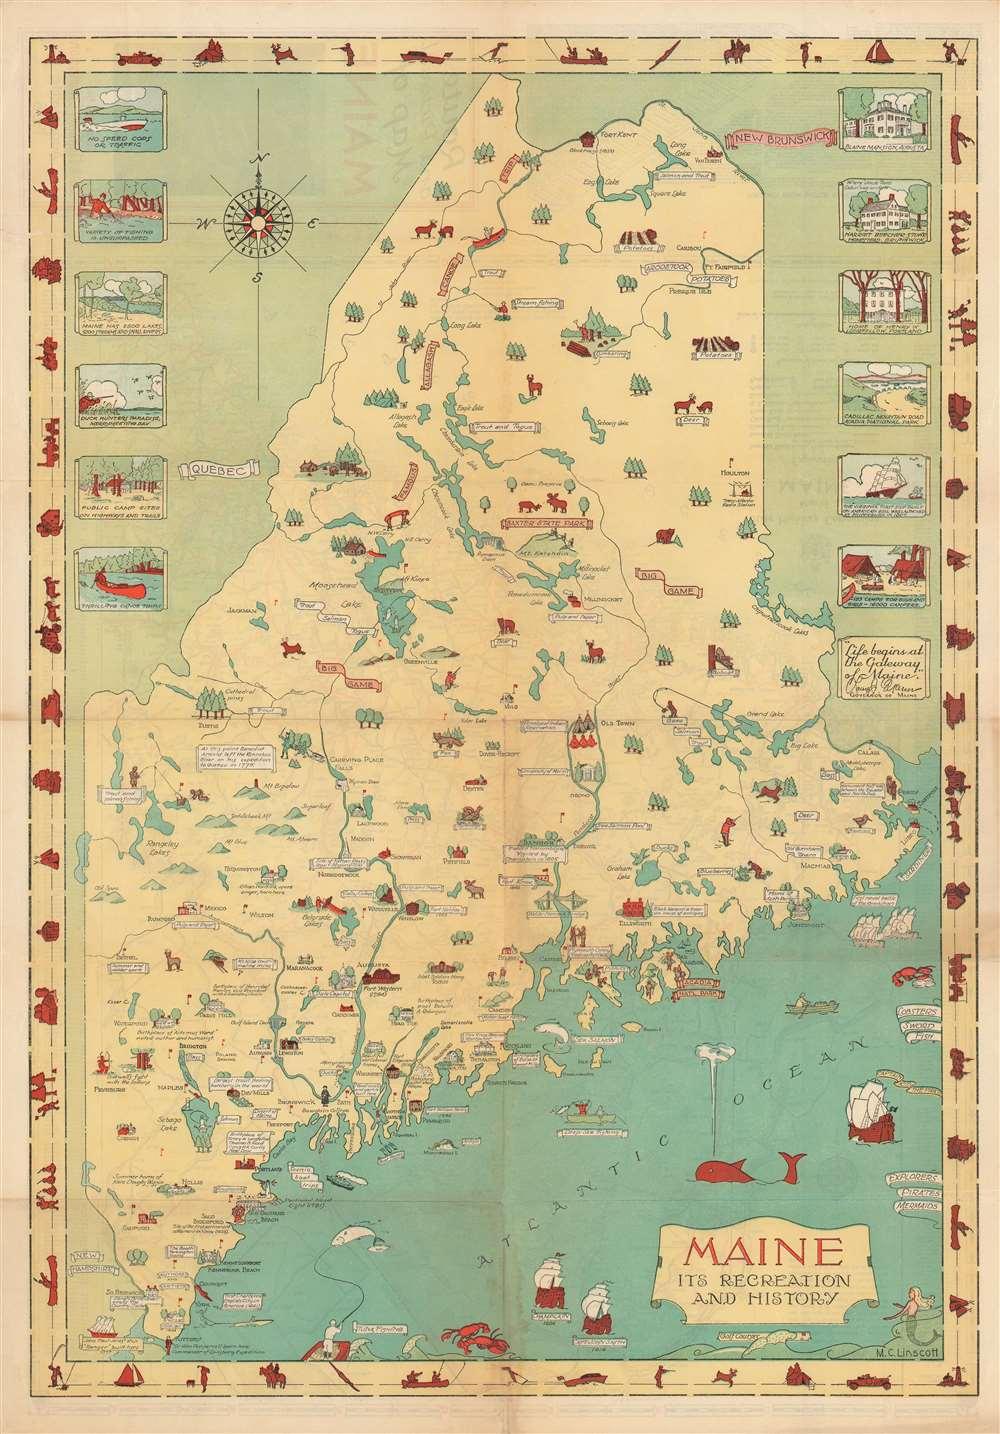 1935 Linscott Pictorial Map of Maine